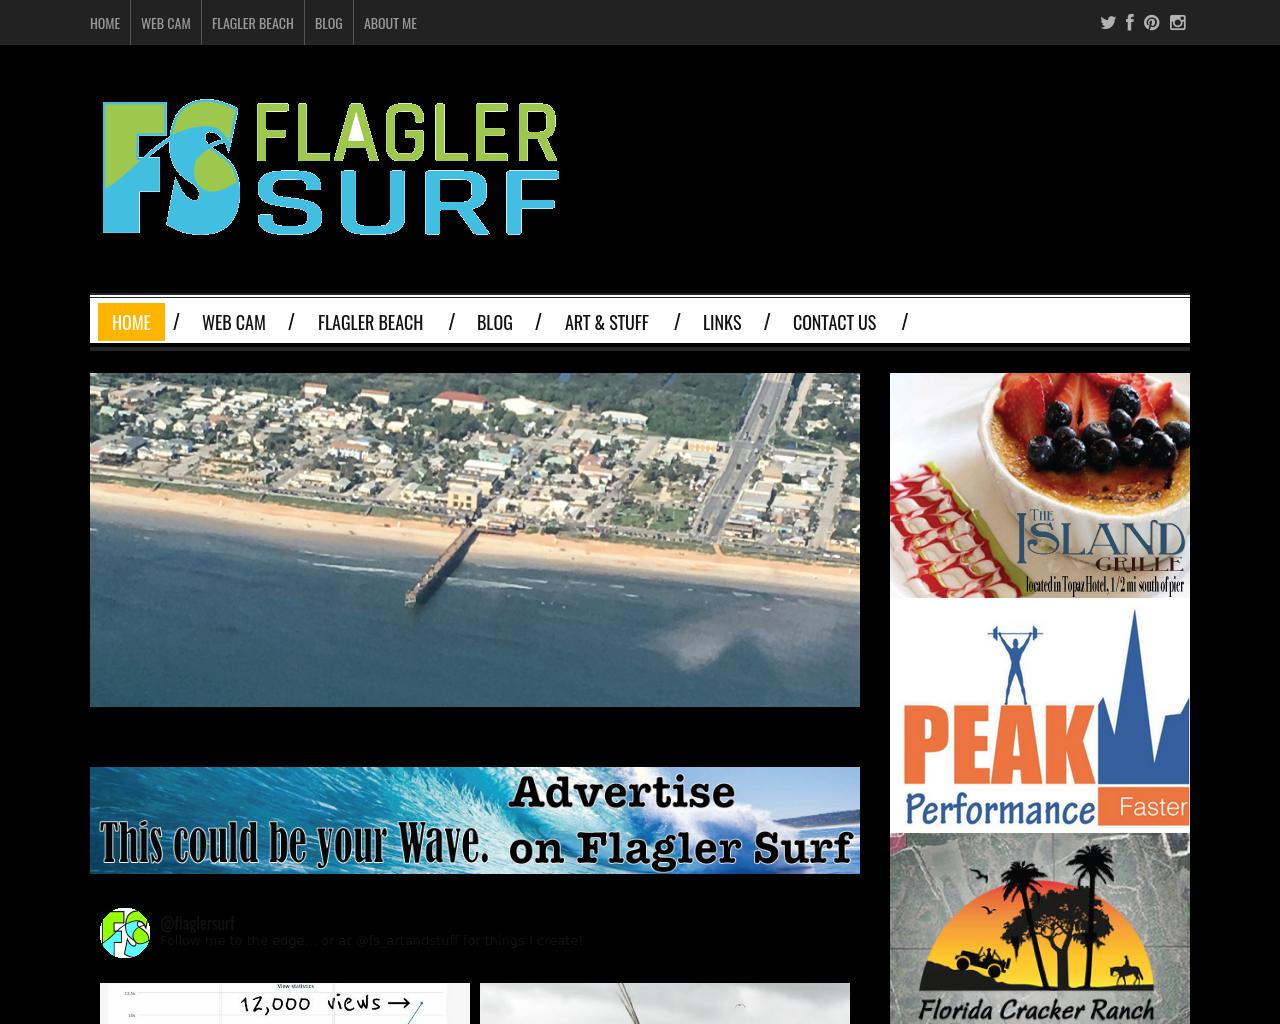 Flagler-Surf-Advertising-Reviews-Pricing